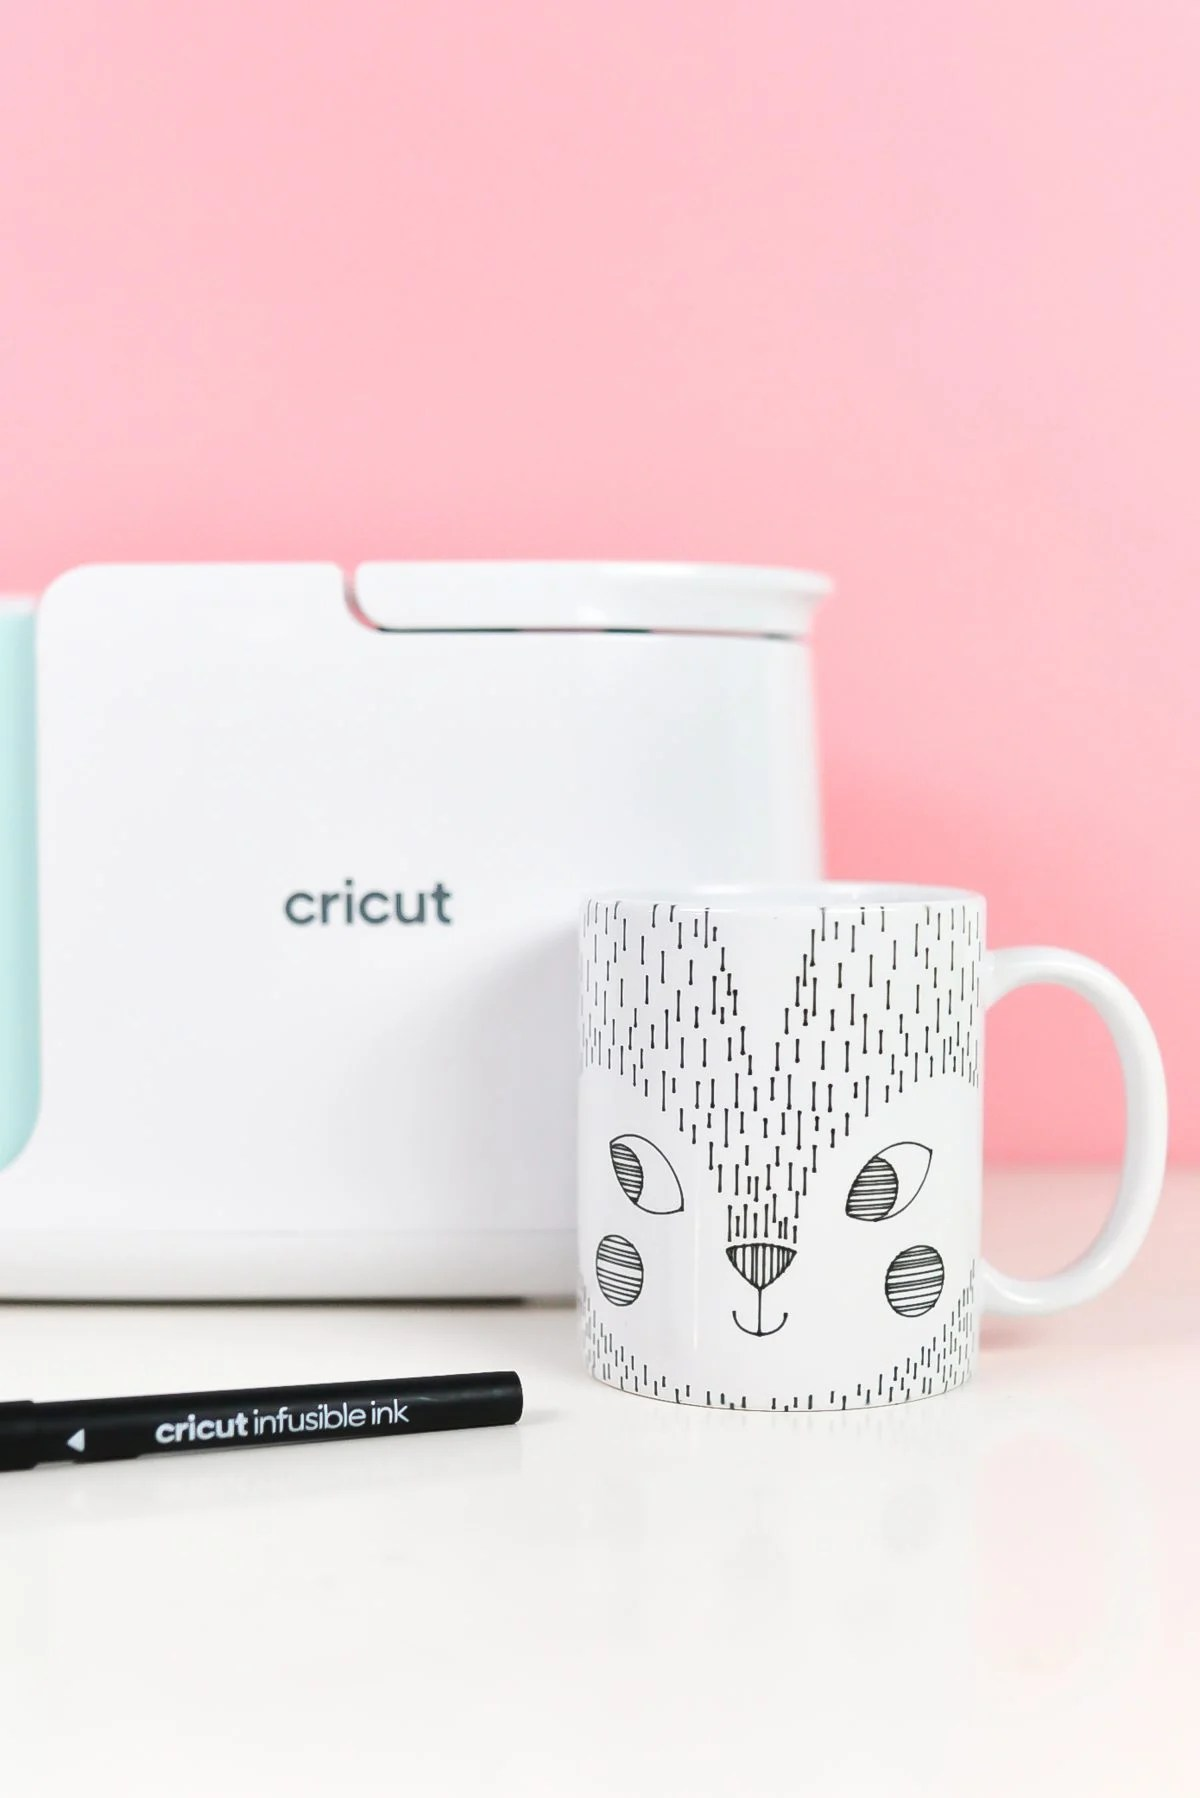 Final skunk mug using pens with Mug Press on pink background